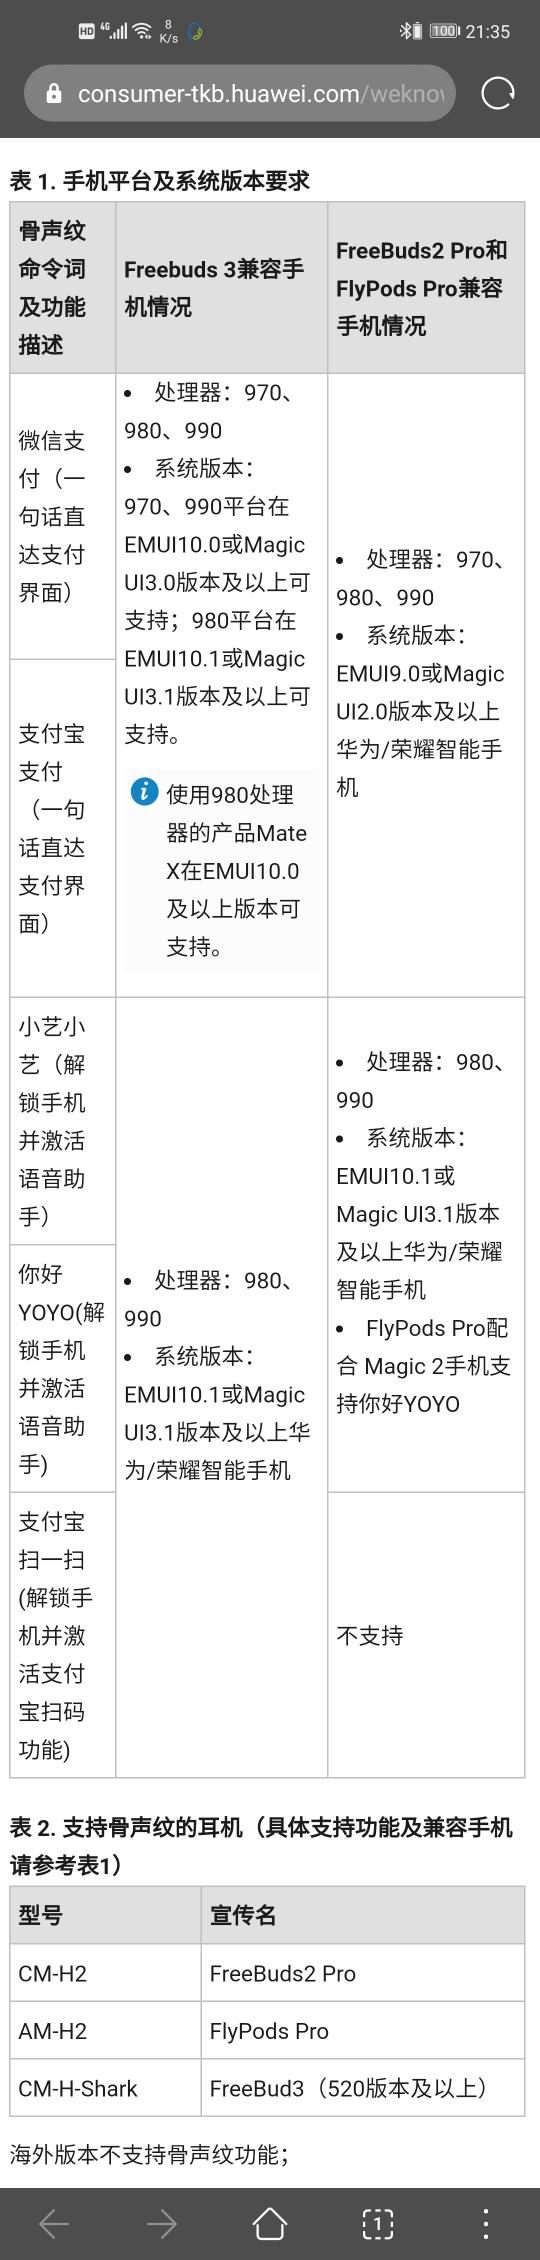 Screenshot_20200408_213518_com.huawei.browser.jpg